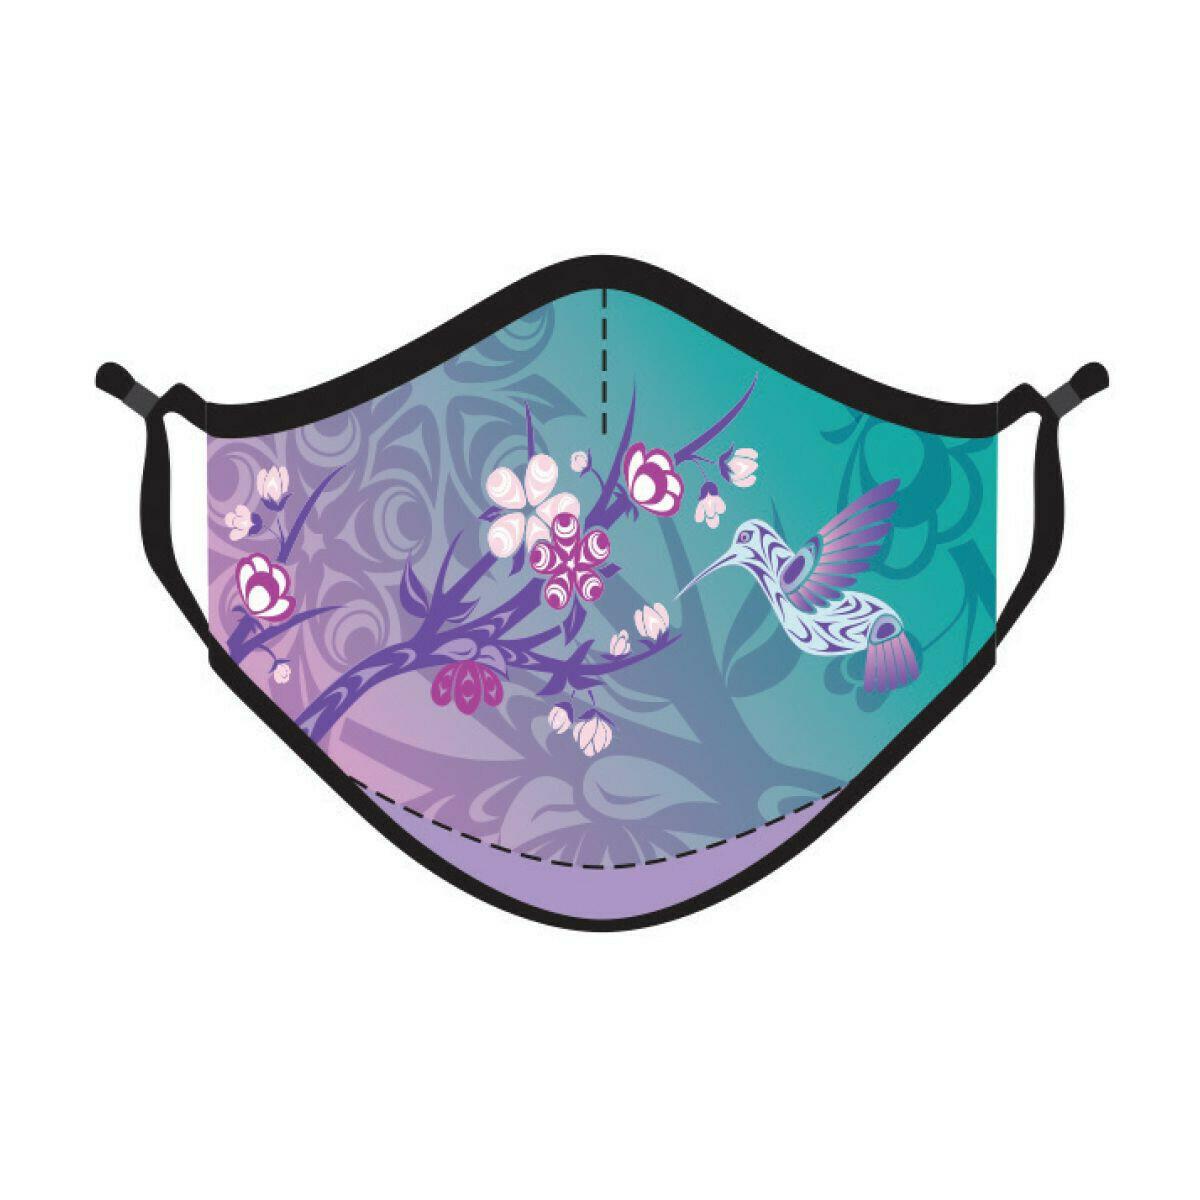 Hummingbird & Blossoms 4-ply Face Mask